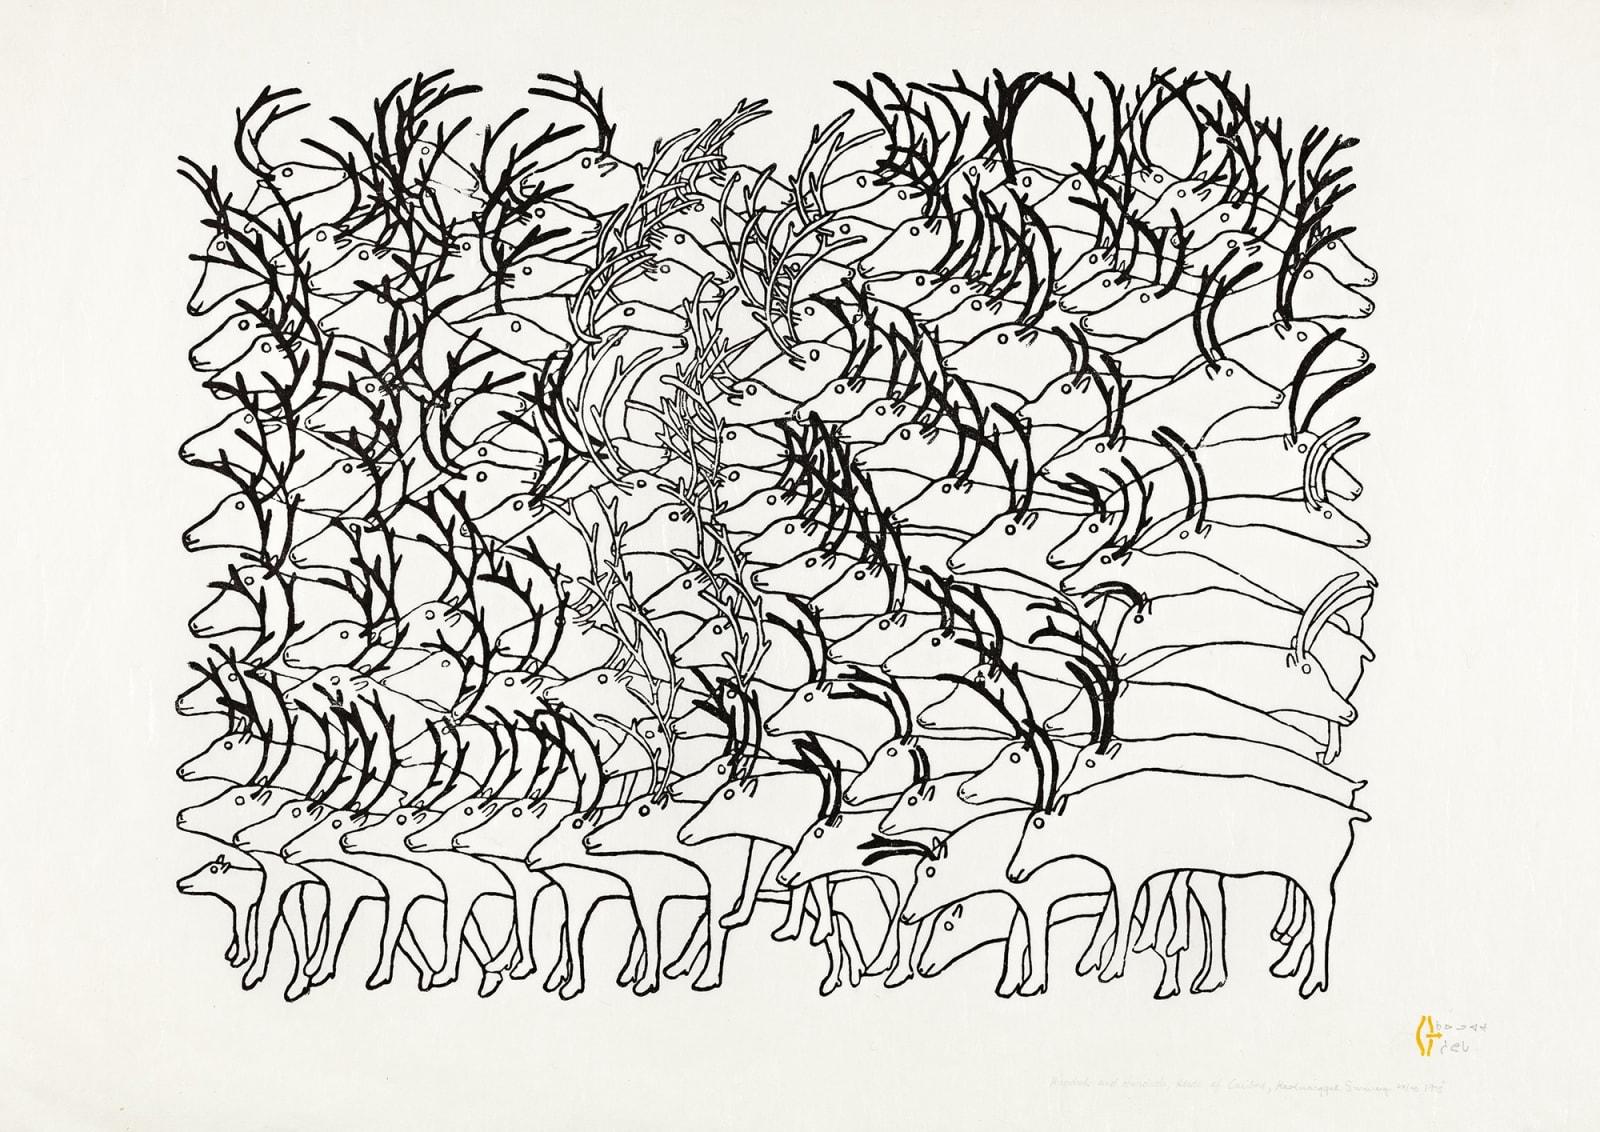 Lot 84 RUTH QAULLUARYUK (1932-) QAMANI'TUAQ (BAKER LAKE) Hundreds and Hundreds, Herds of Caribou, 1975 #1 stonecut, 25 x 37 in (63.5 x 94 cm). Estimate: $3,500— $5,000 Price realized: $10,200